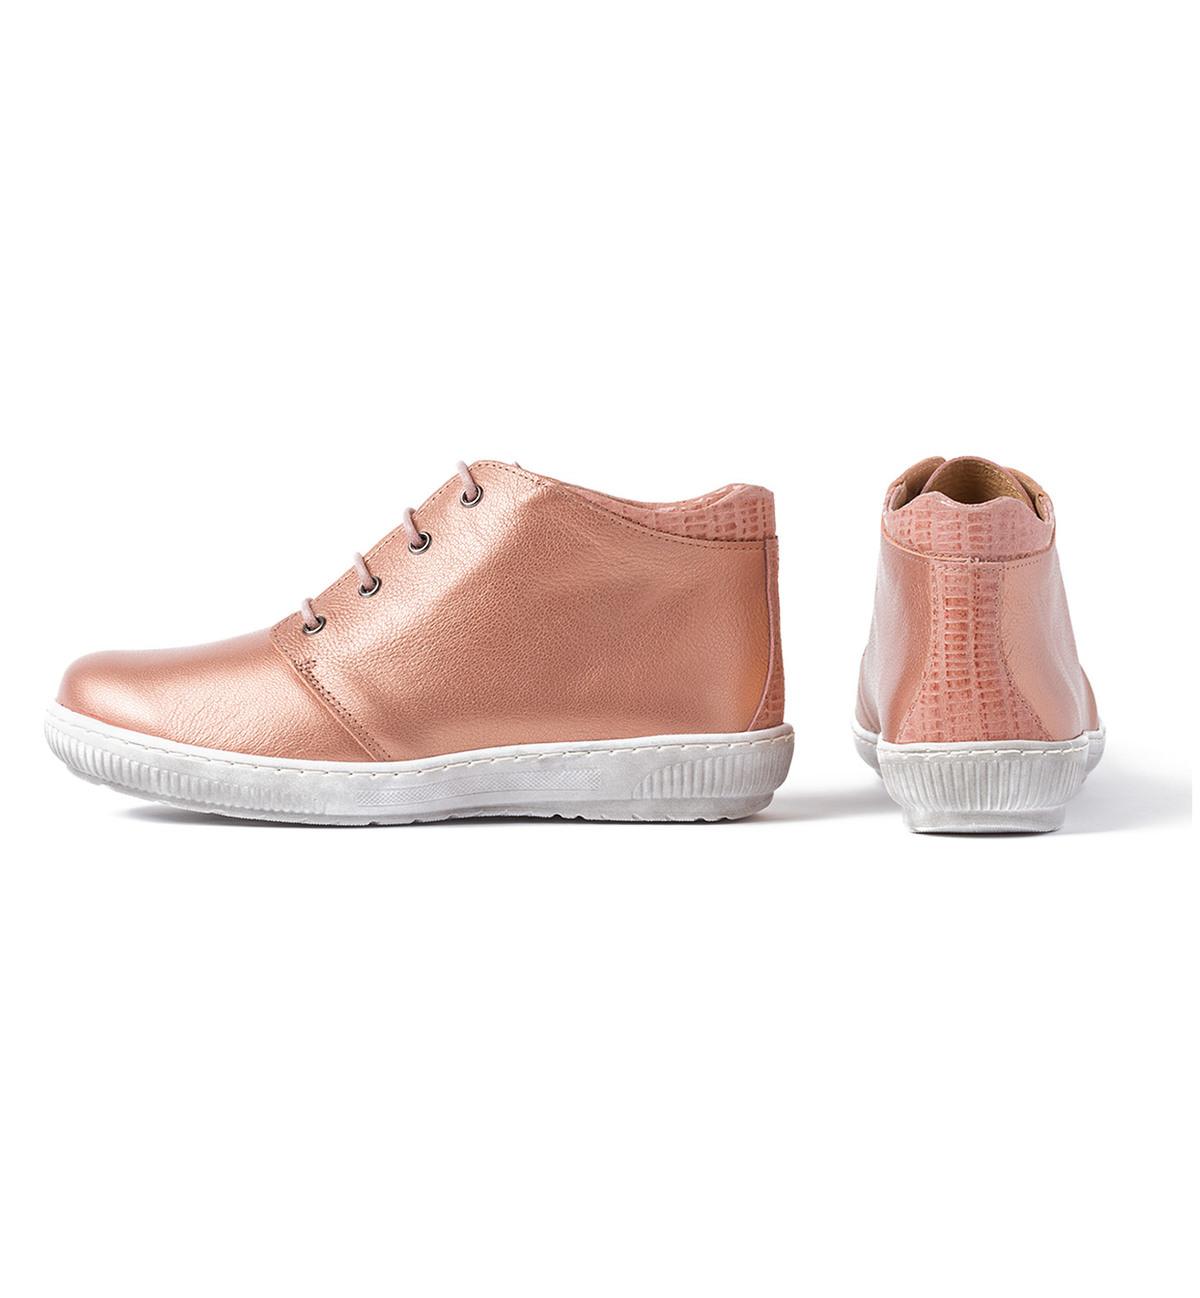 Sneaker Hightop Rosé LaShoe Auslass 100% Garantiert tlNYrq